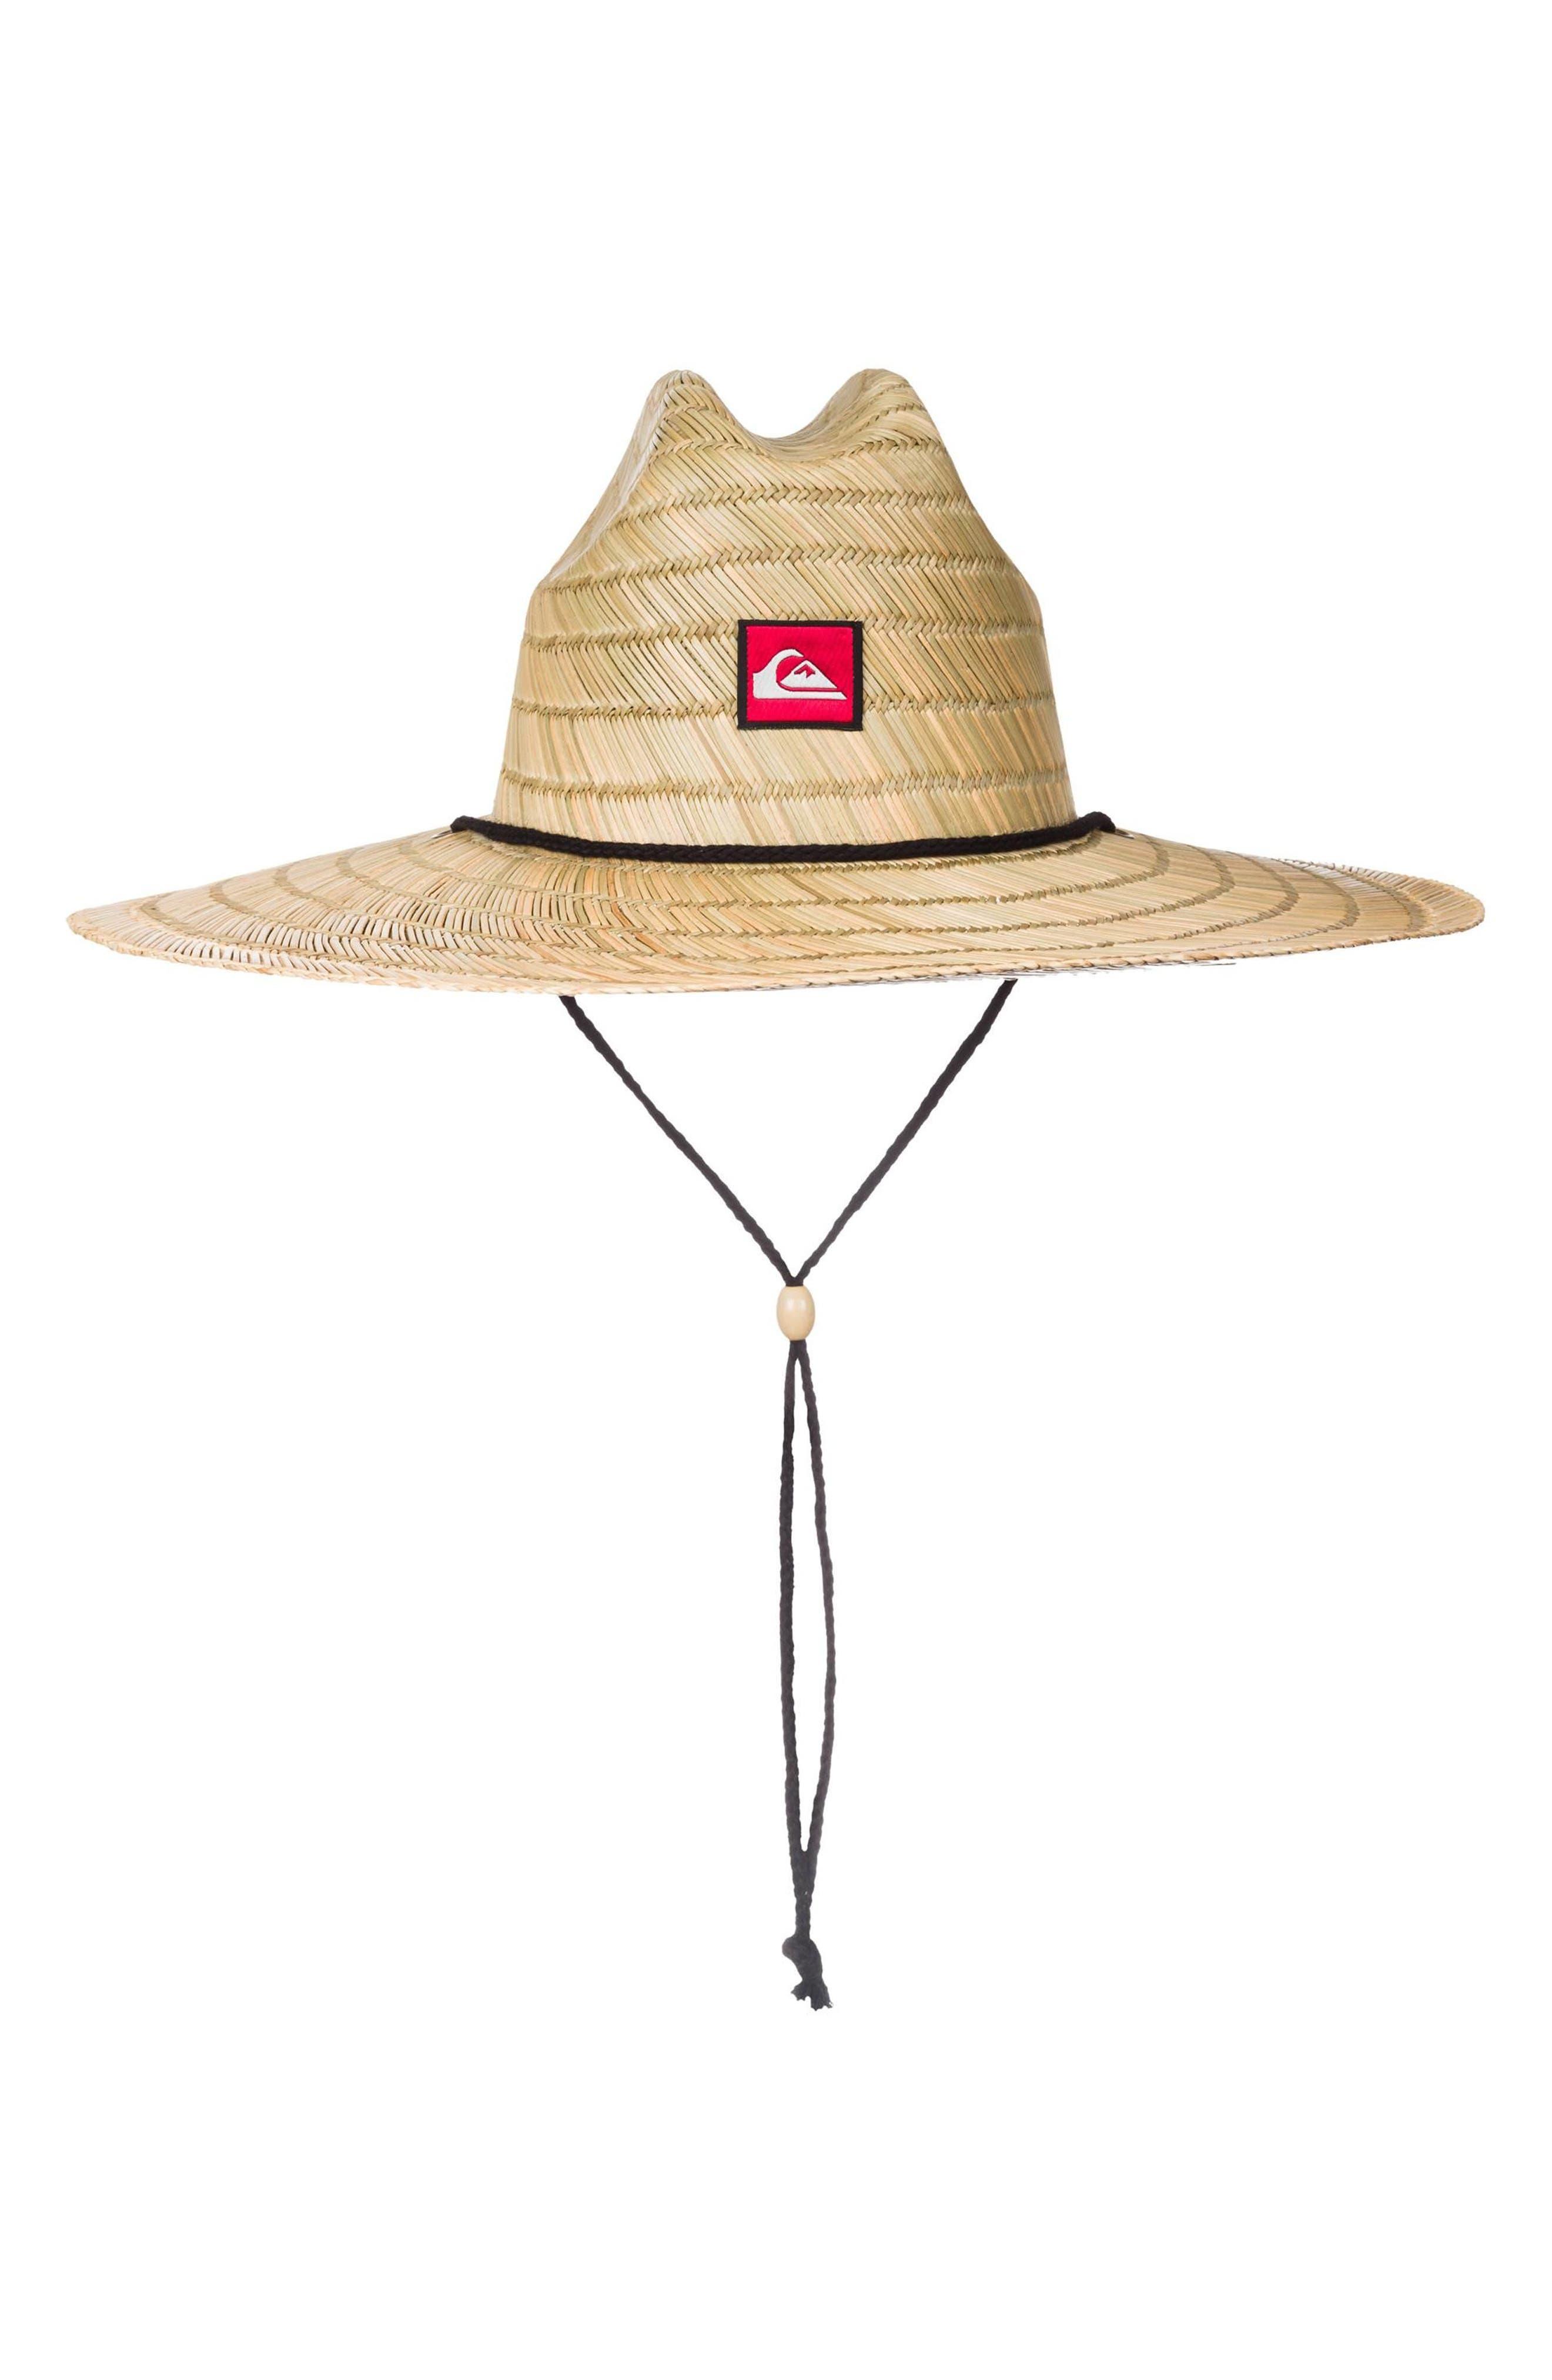 Quiksilver Pierside Straw Outback Hat